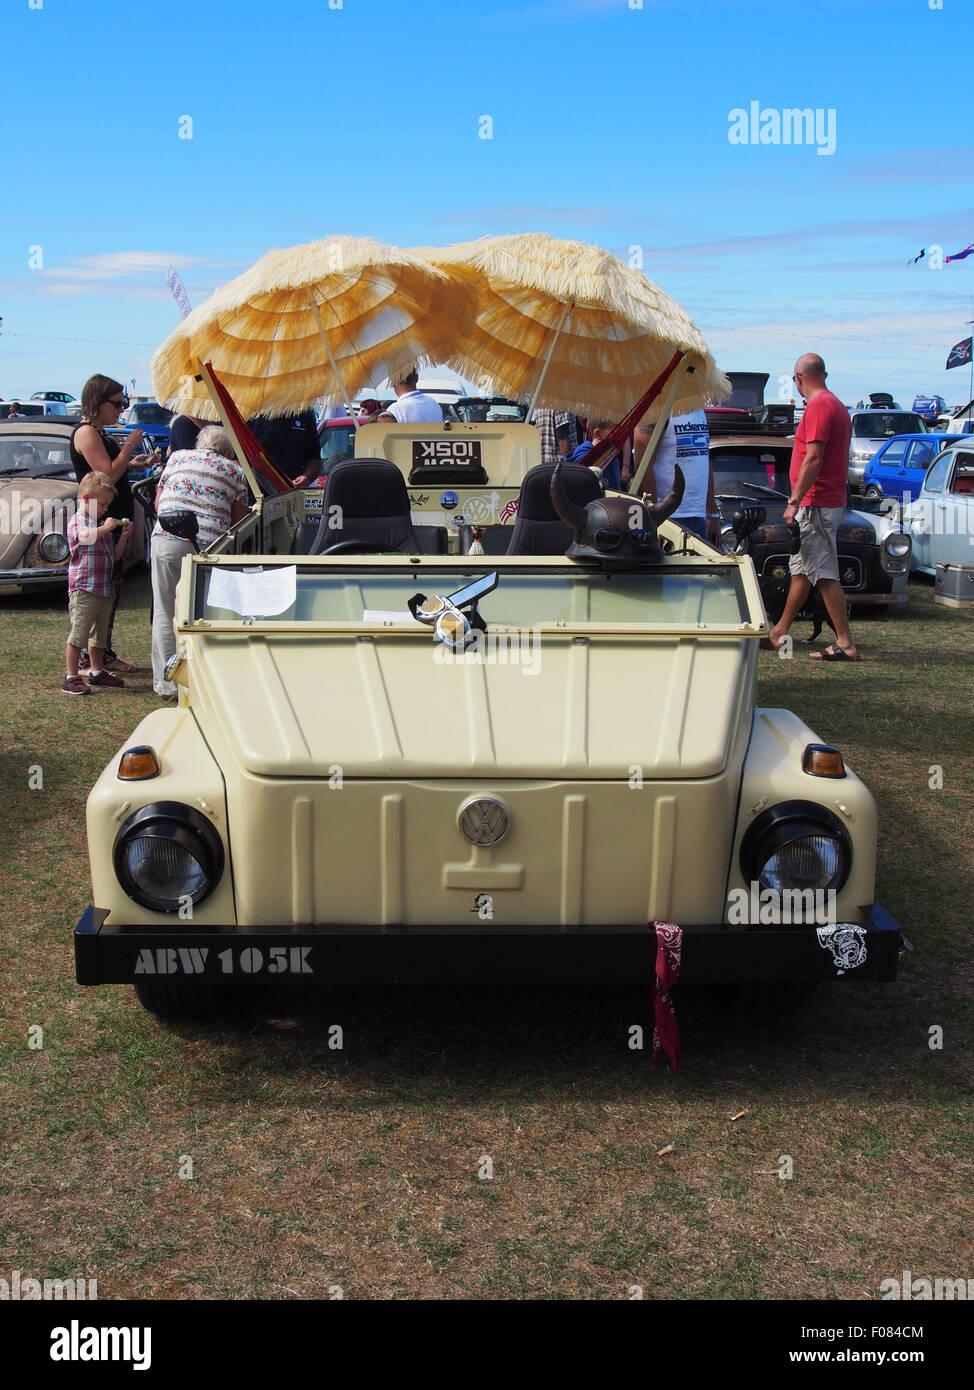 Volkswagen Type 181 Trekker Also Known As Kurierwagen The Thing Stock Photo Alamy